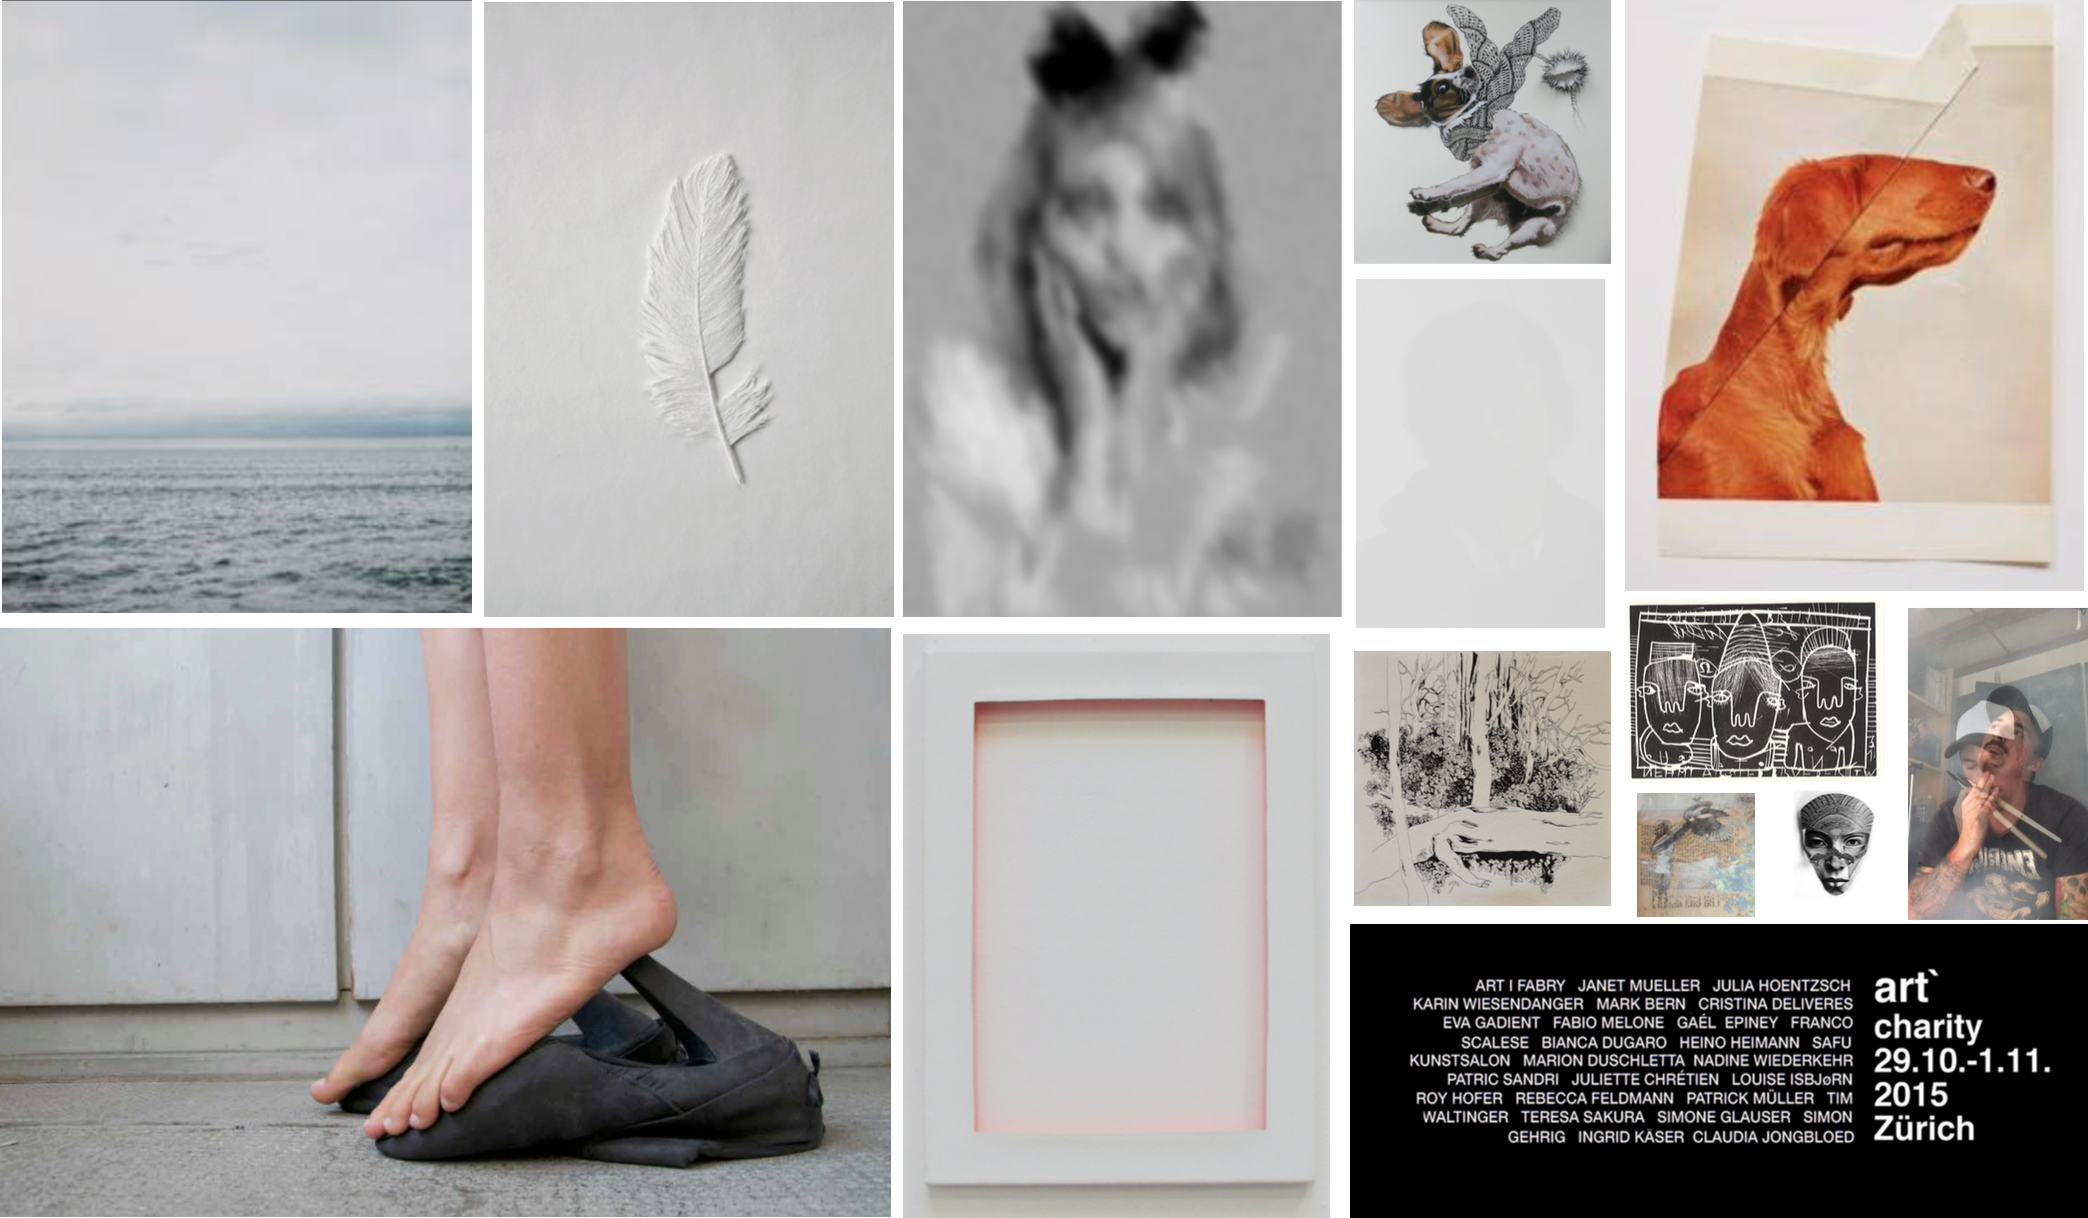 art`box / art`charity / art`we